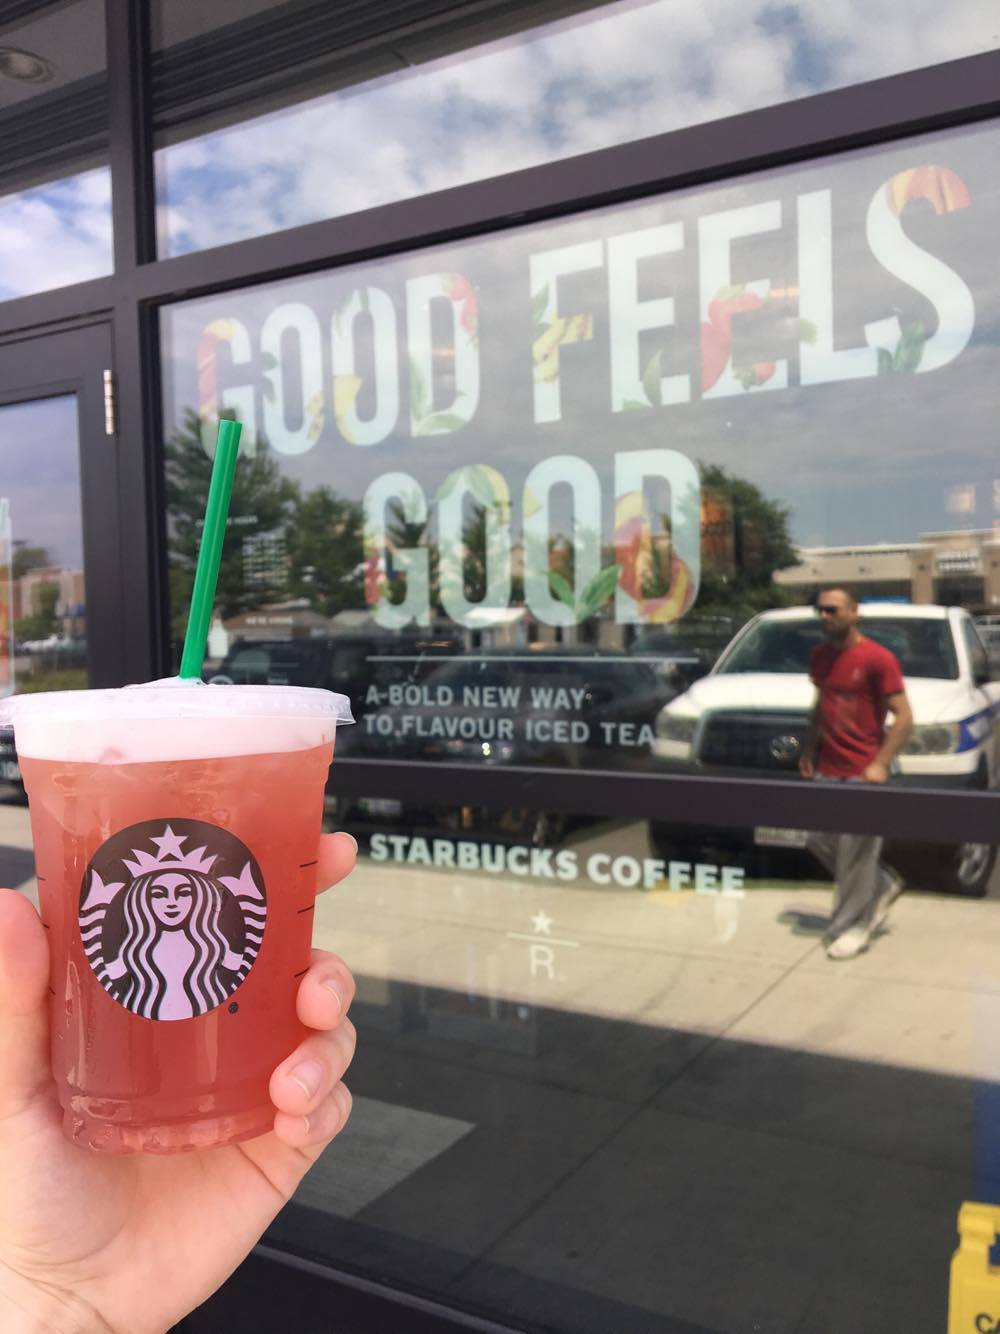 Starbucks Teavana Peach Green Tea Review